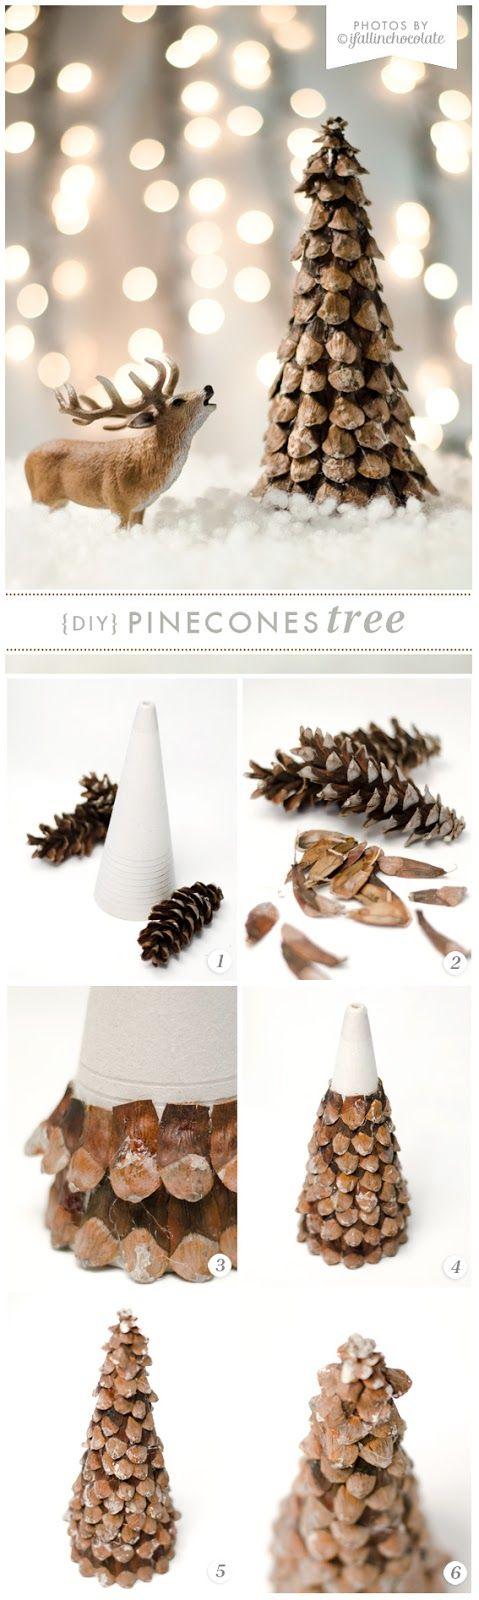 I Fall in Chocolate: DIY PINECONE XMAS TREE - so sweet